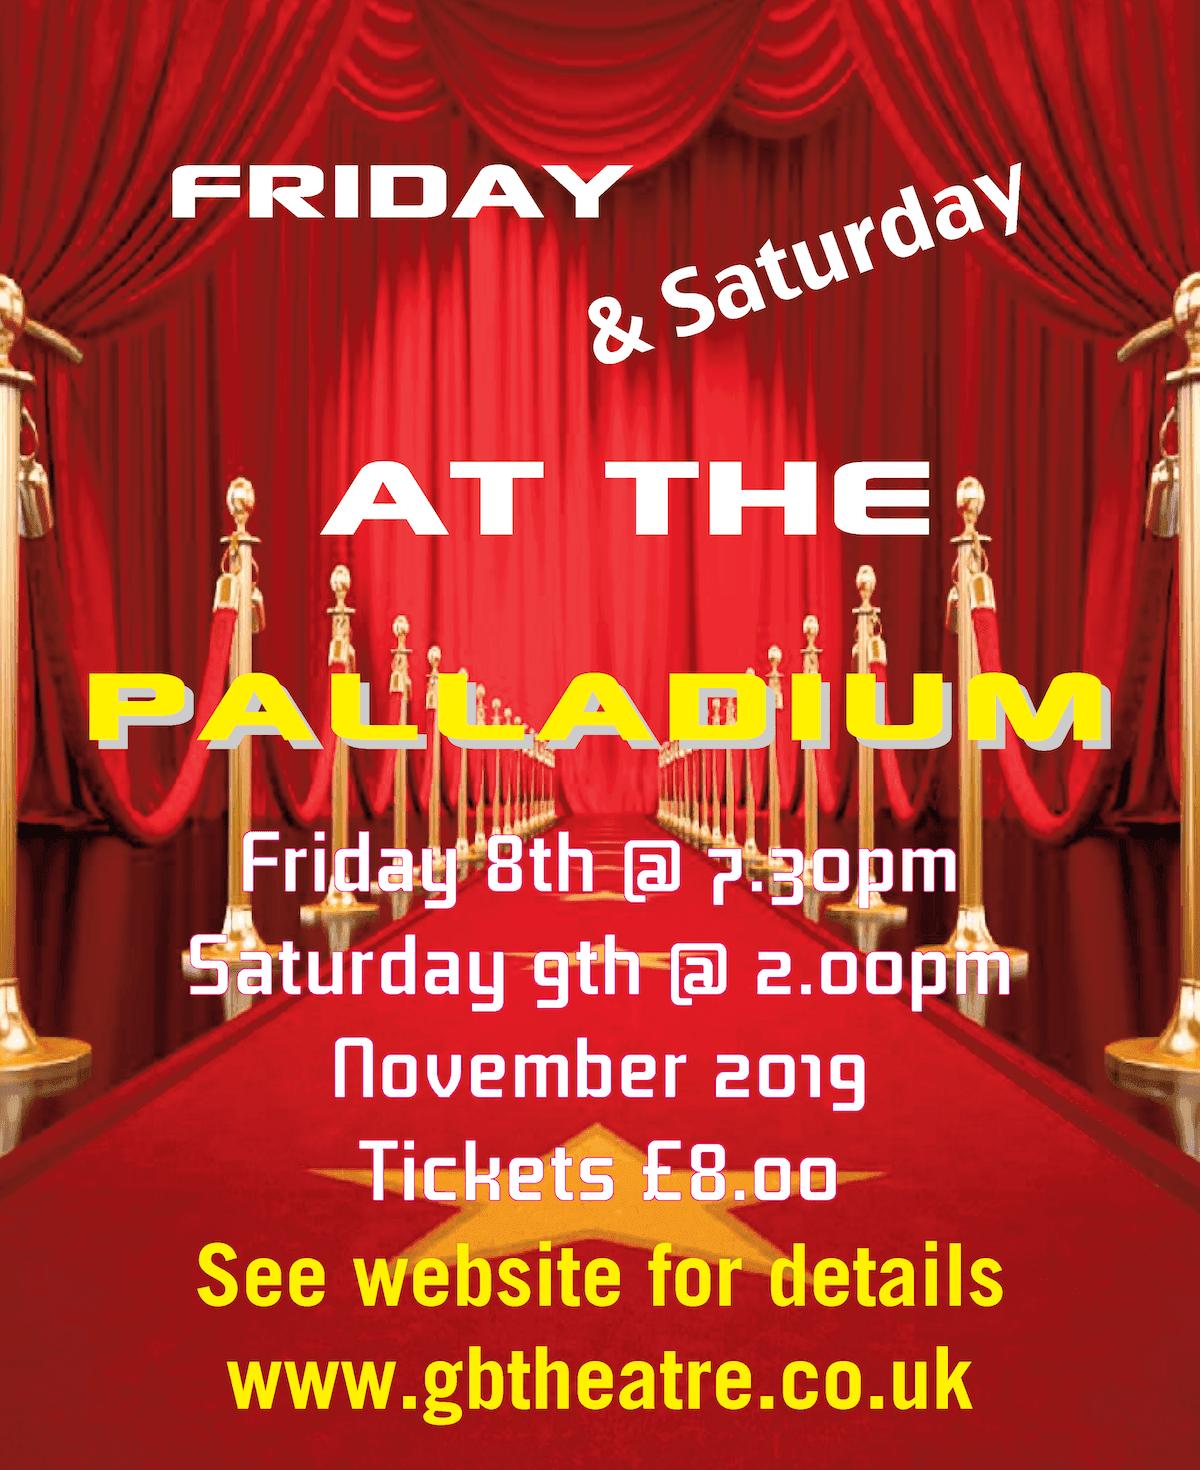 ...At The Palladium banner image